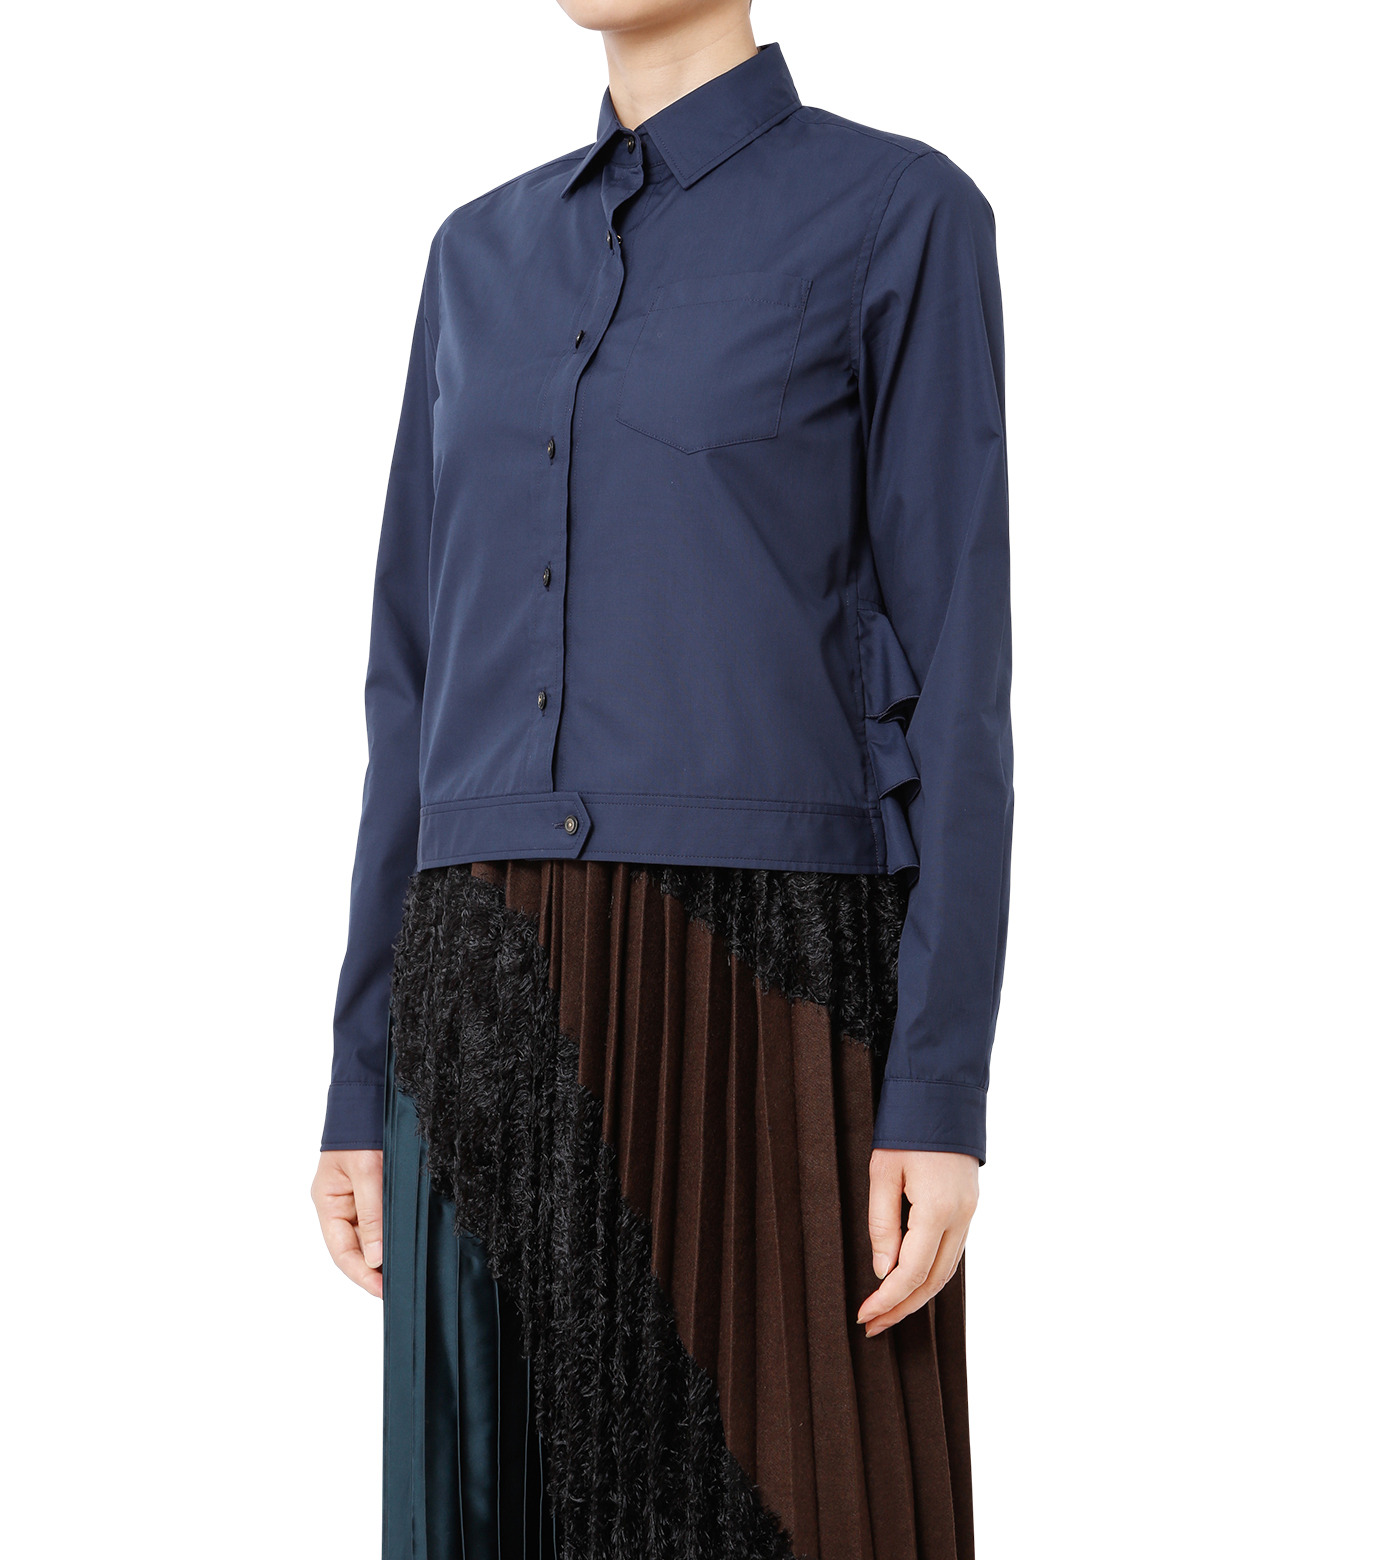 KOLOR(カラー)のShirt w/Back Ruffle Detail-NAVY(シャツ/shirt)-16WCL-B02134-93 拡大詳細画像1